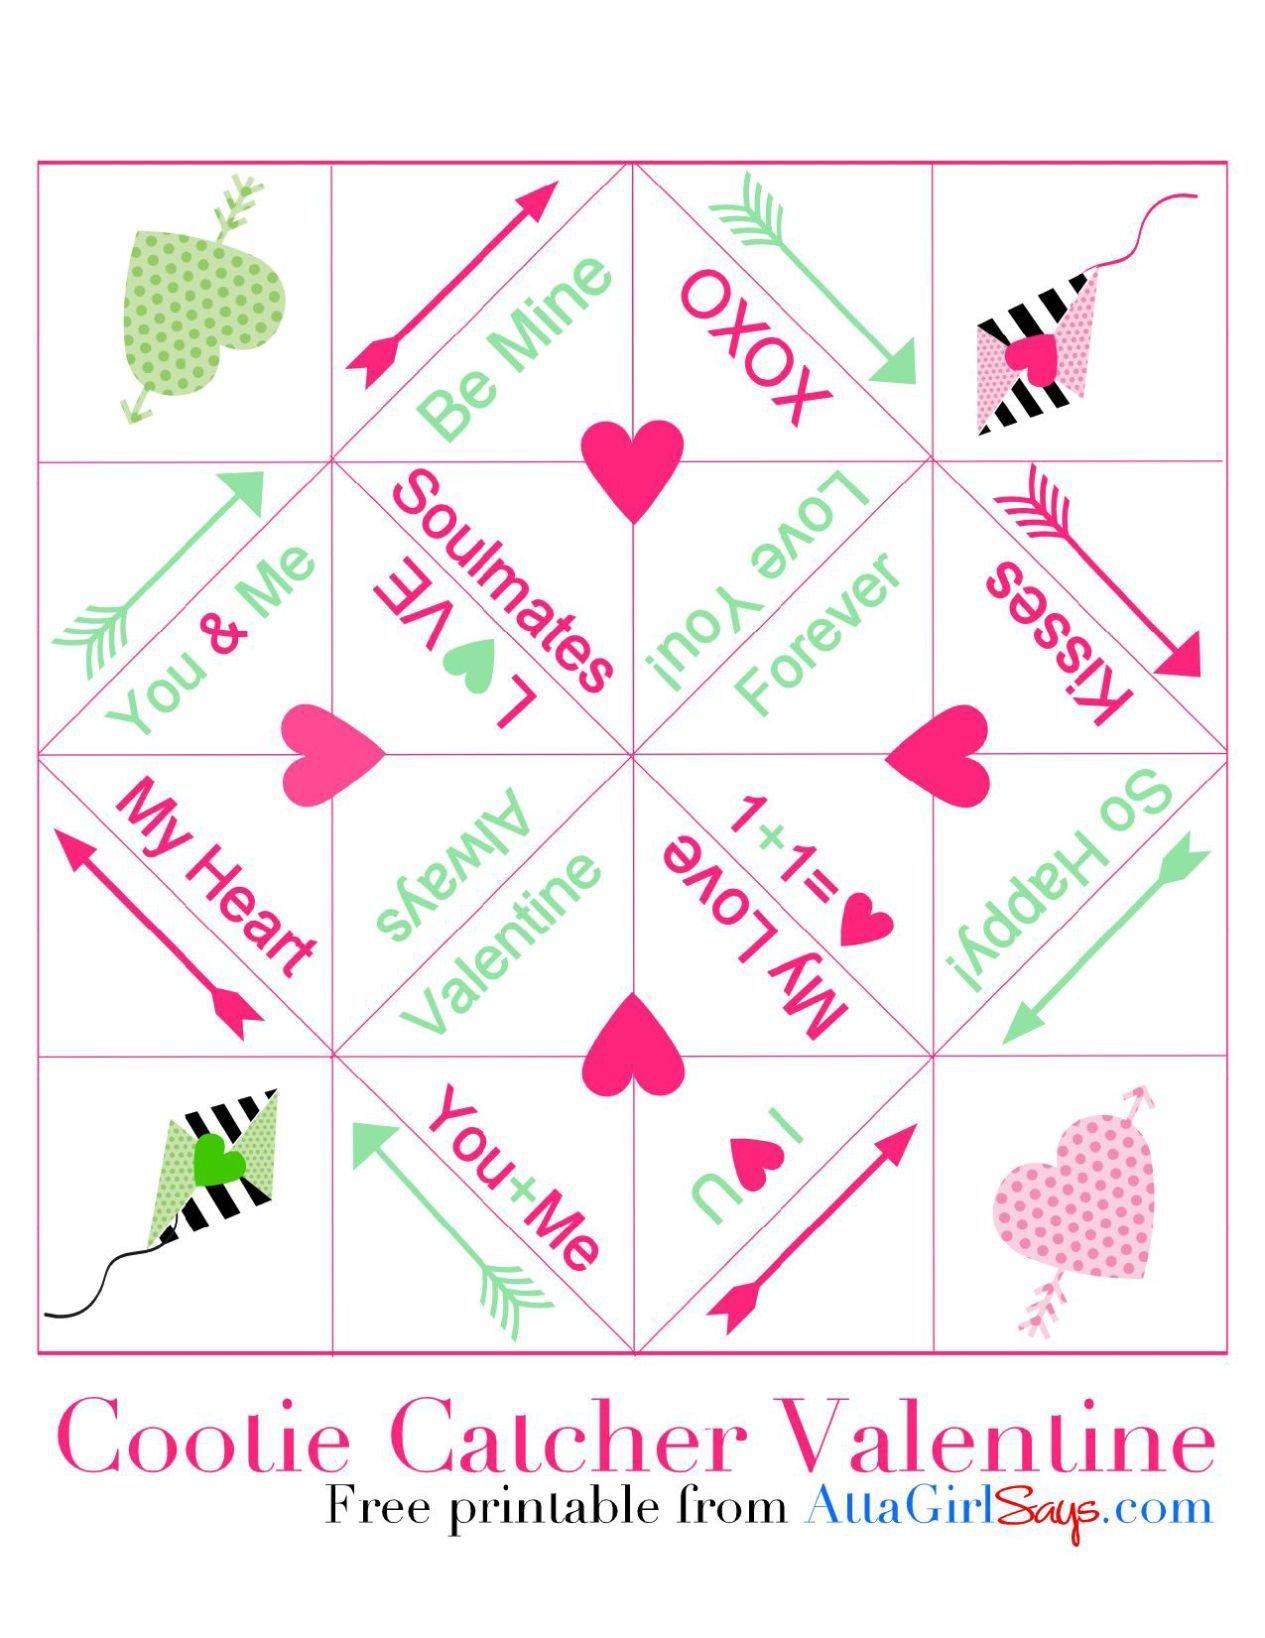 photograph regarding Cootie Catcher Printable named printable-valentine-cootie-catcher.pdf